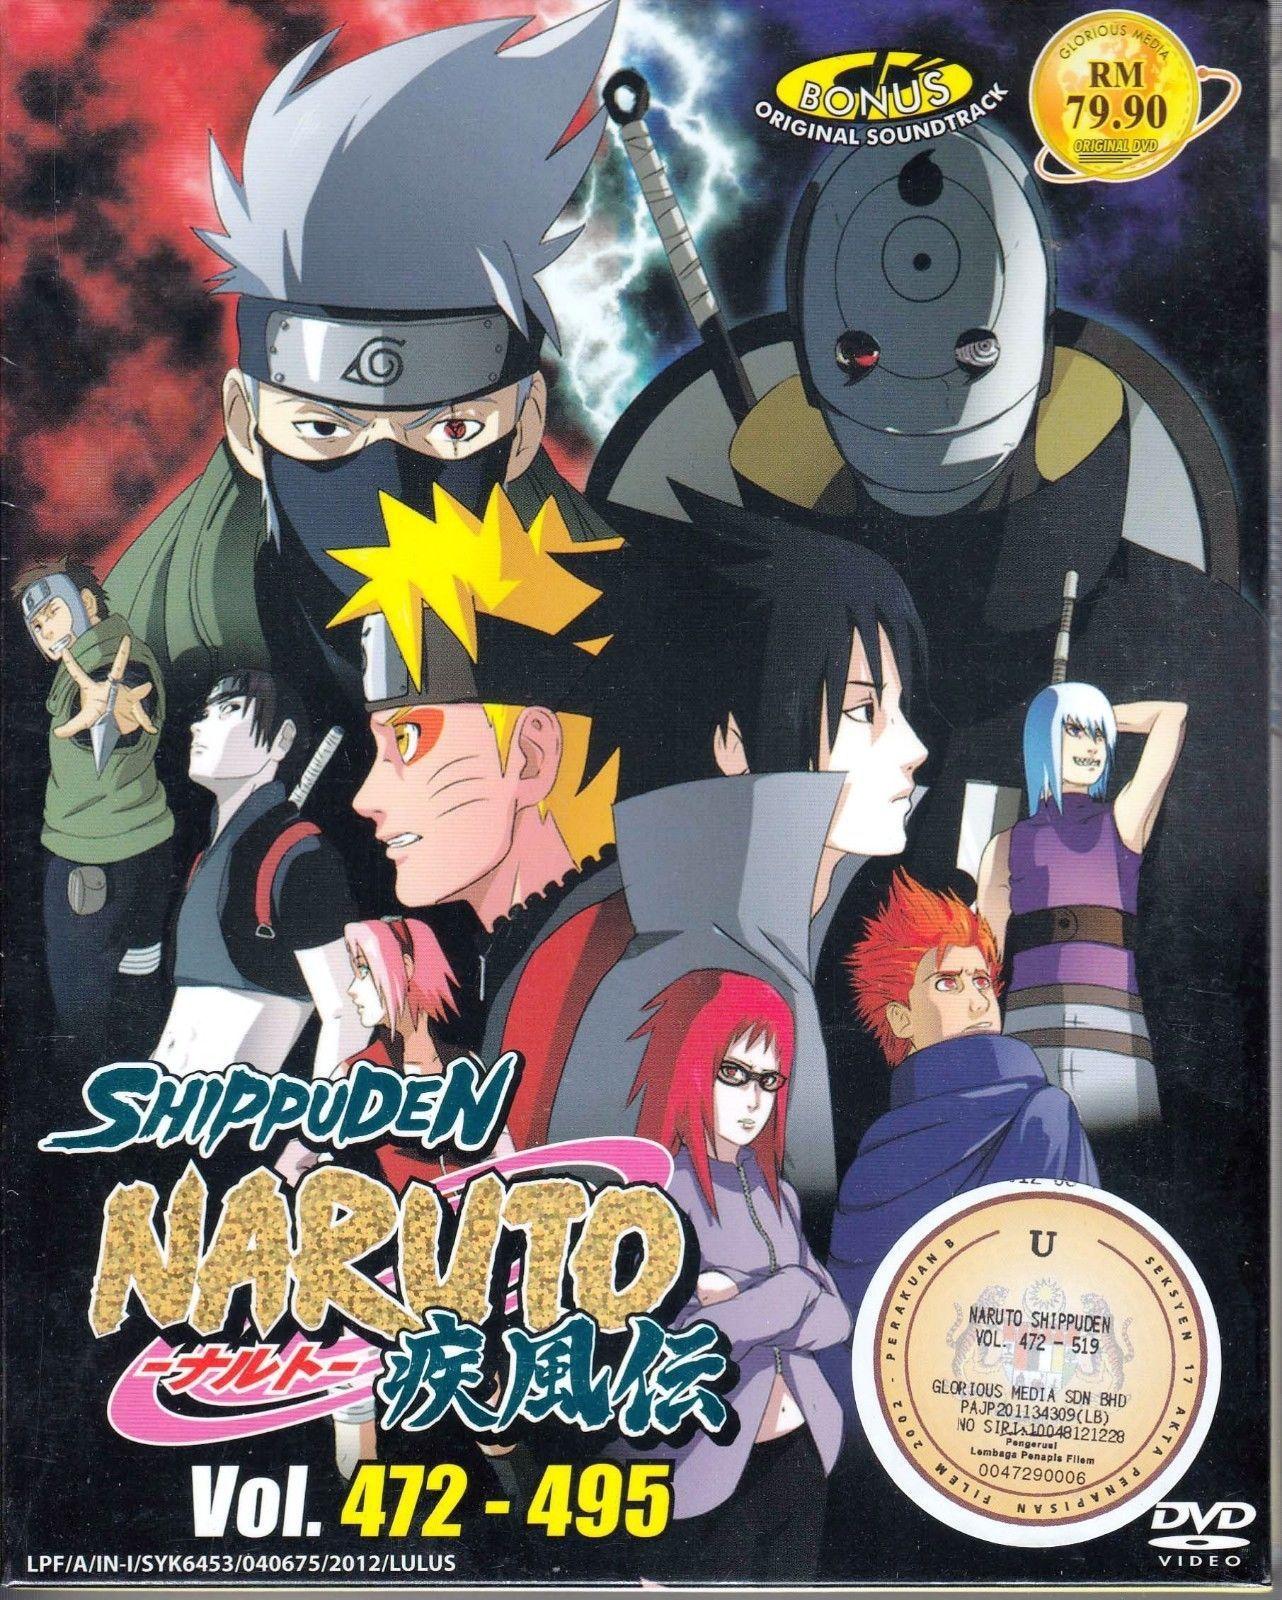 DVD ANIME NARUTO SHIPPUDEN Vol.472-495 Box Set 24 Episode